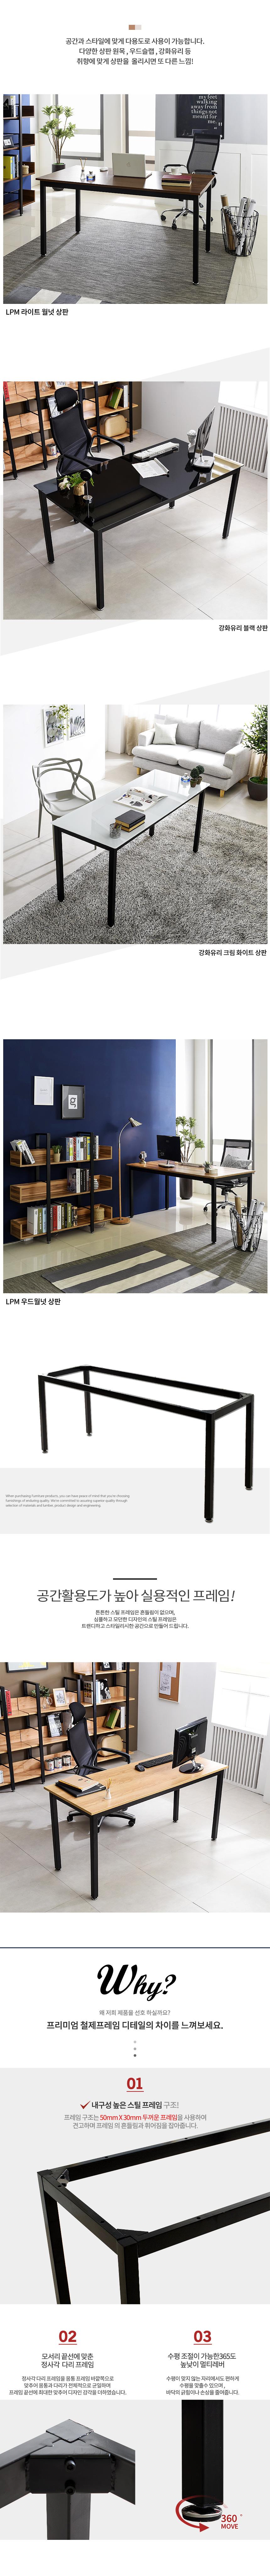 T5 1500 철제프레임 - 동화속나무, 106,000원, DIY 책상/의자, DIY 책상/테이블